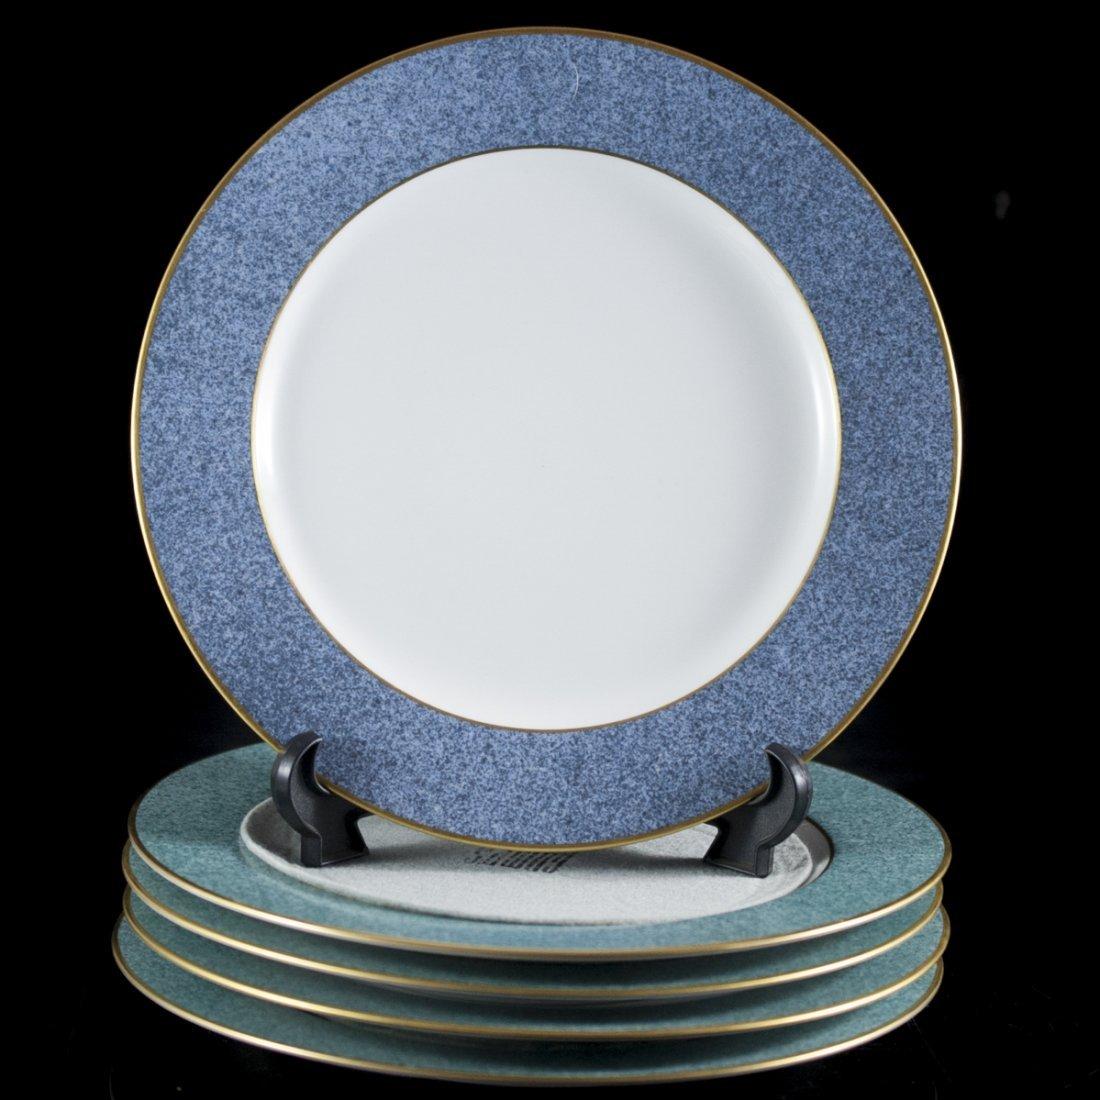 Bernardaud Limoges Porcelain Dinner Plates